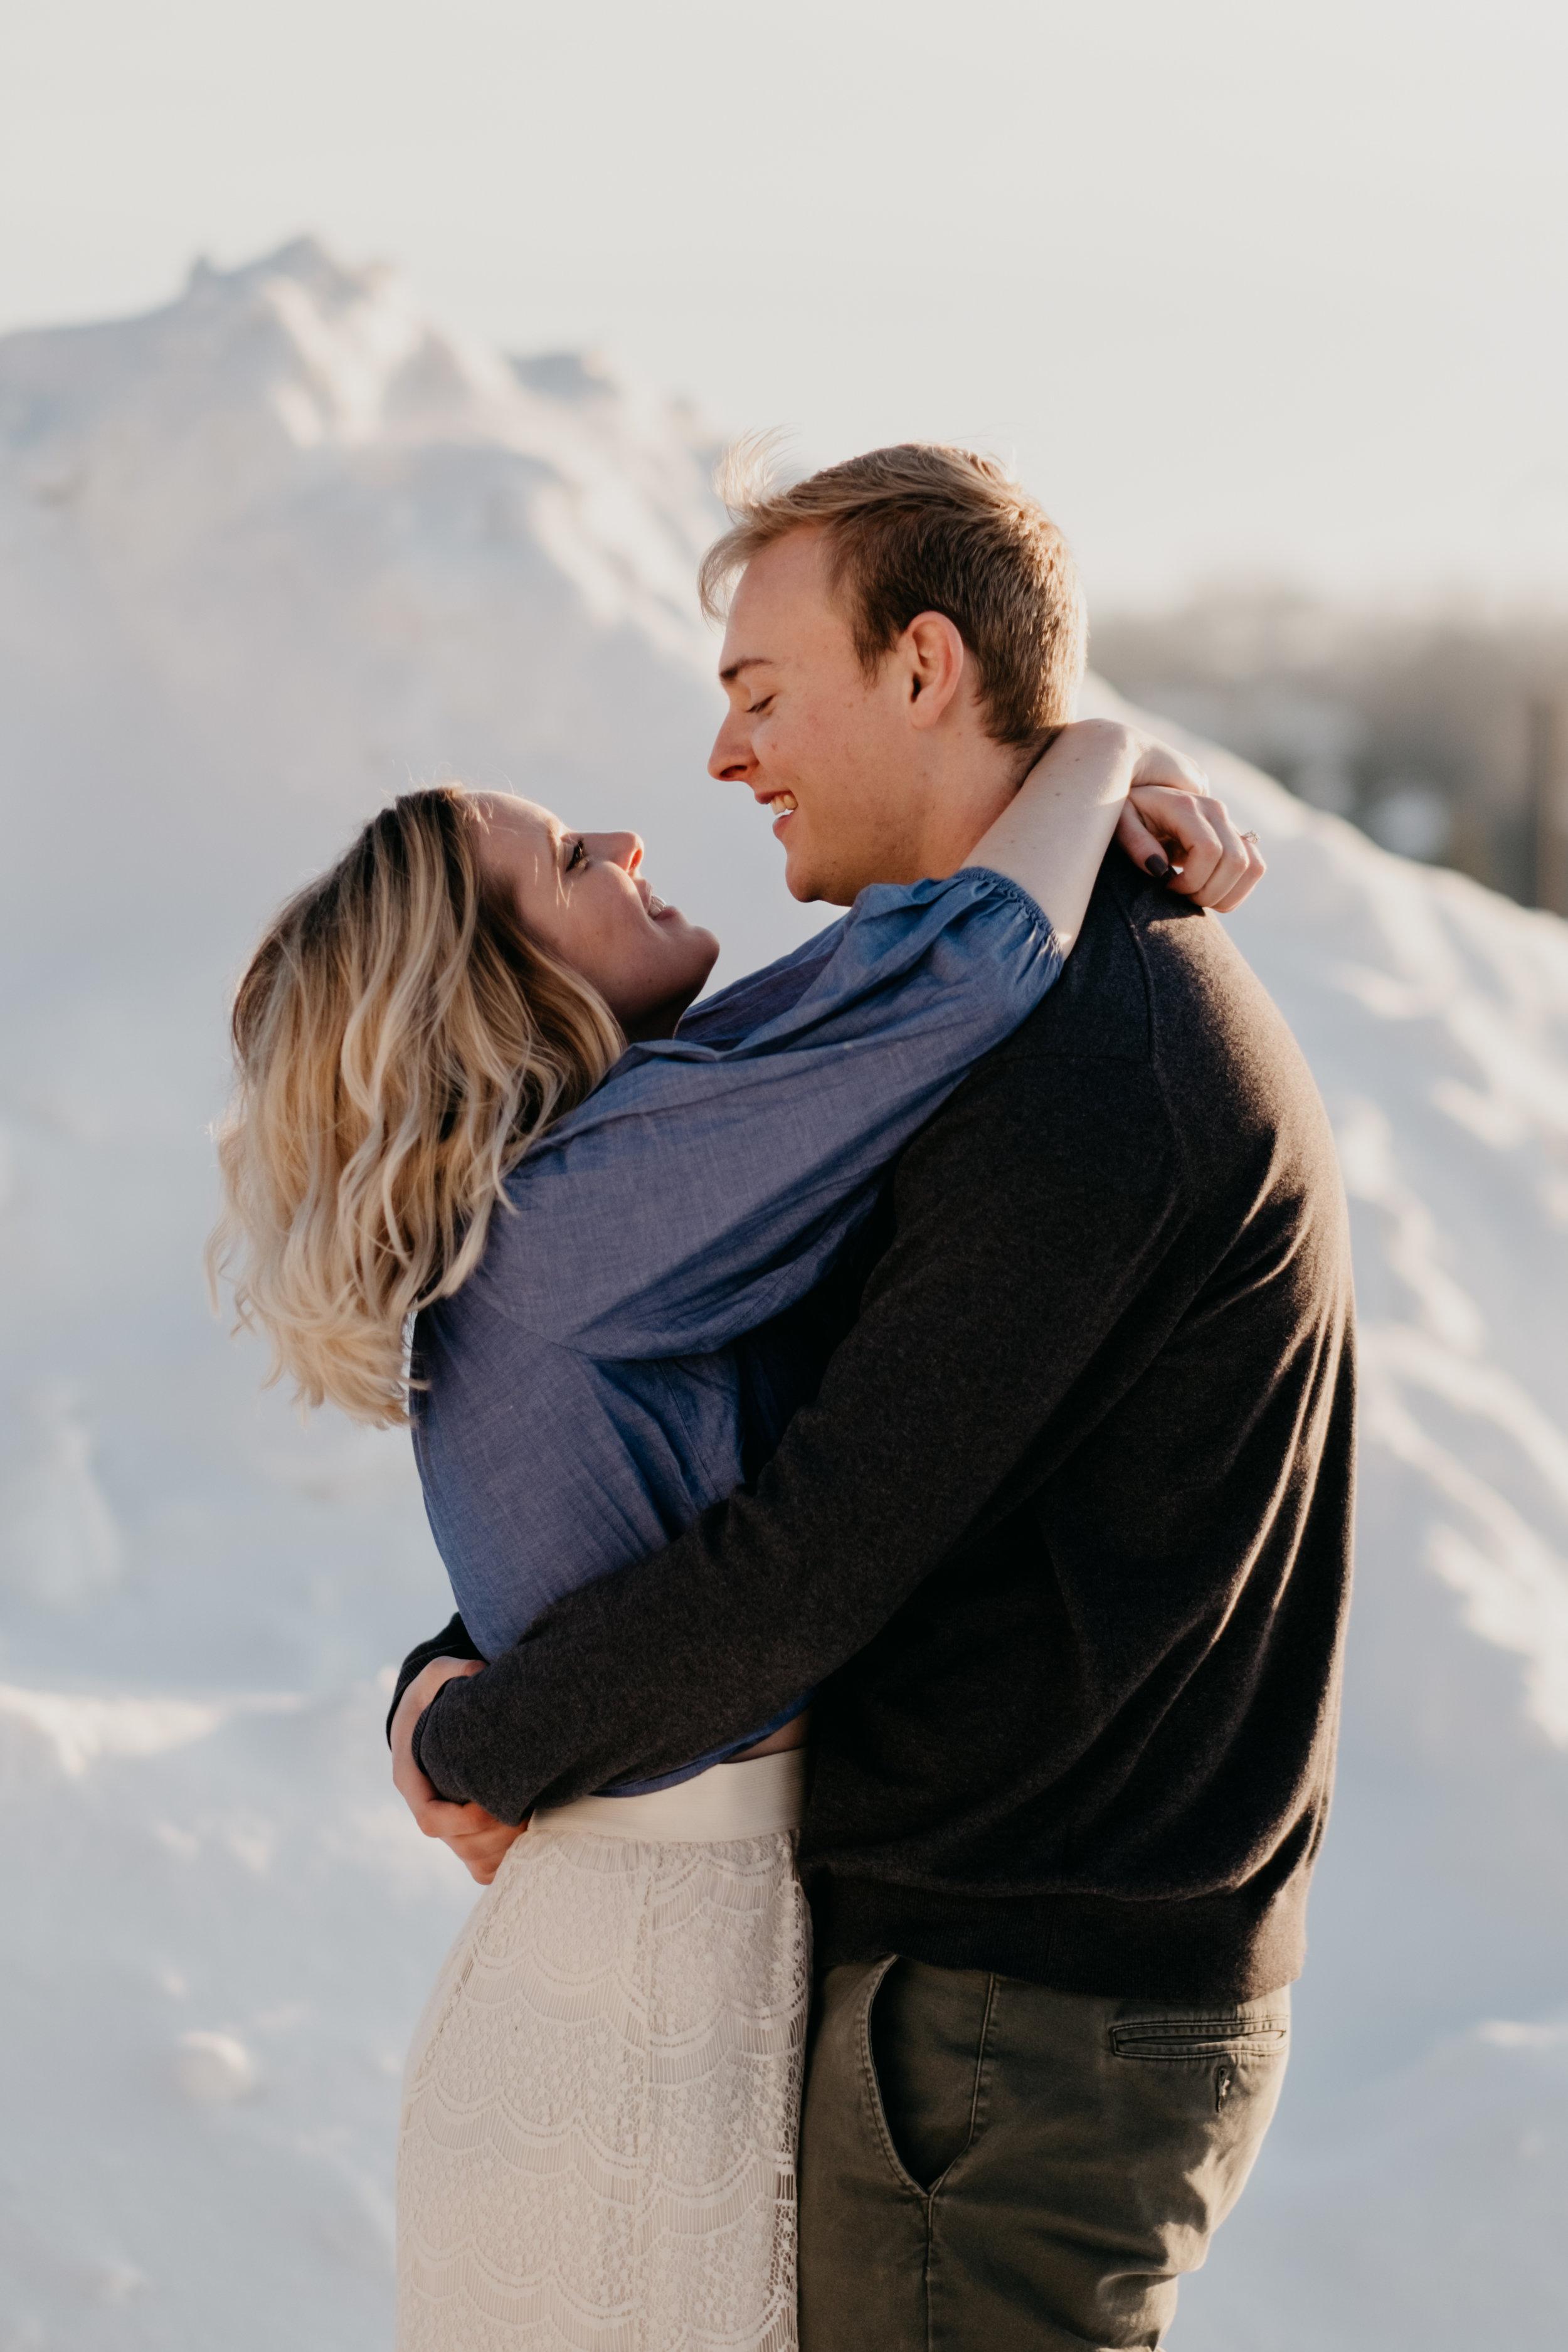 Talia + Brendan | Engagement Photography | Sioux Falls, South Dakota Photographer-52.jpg